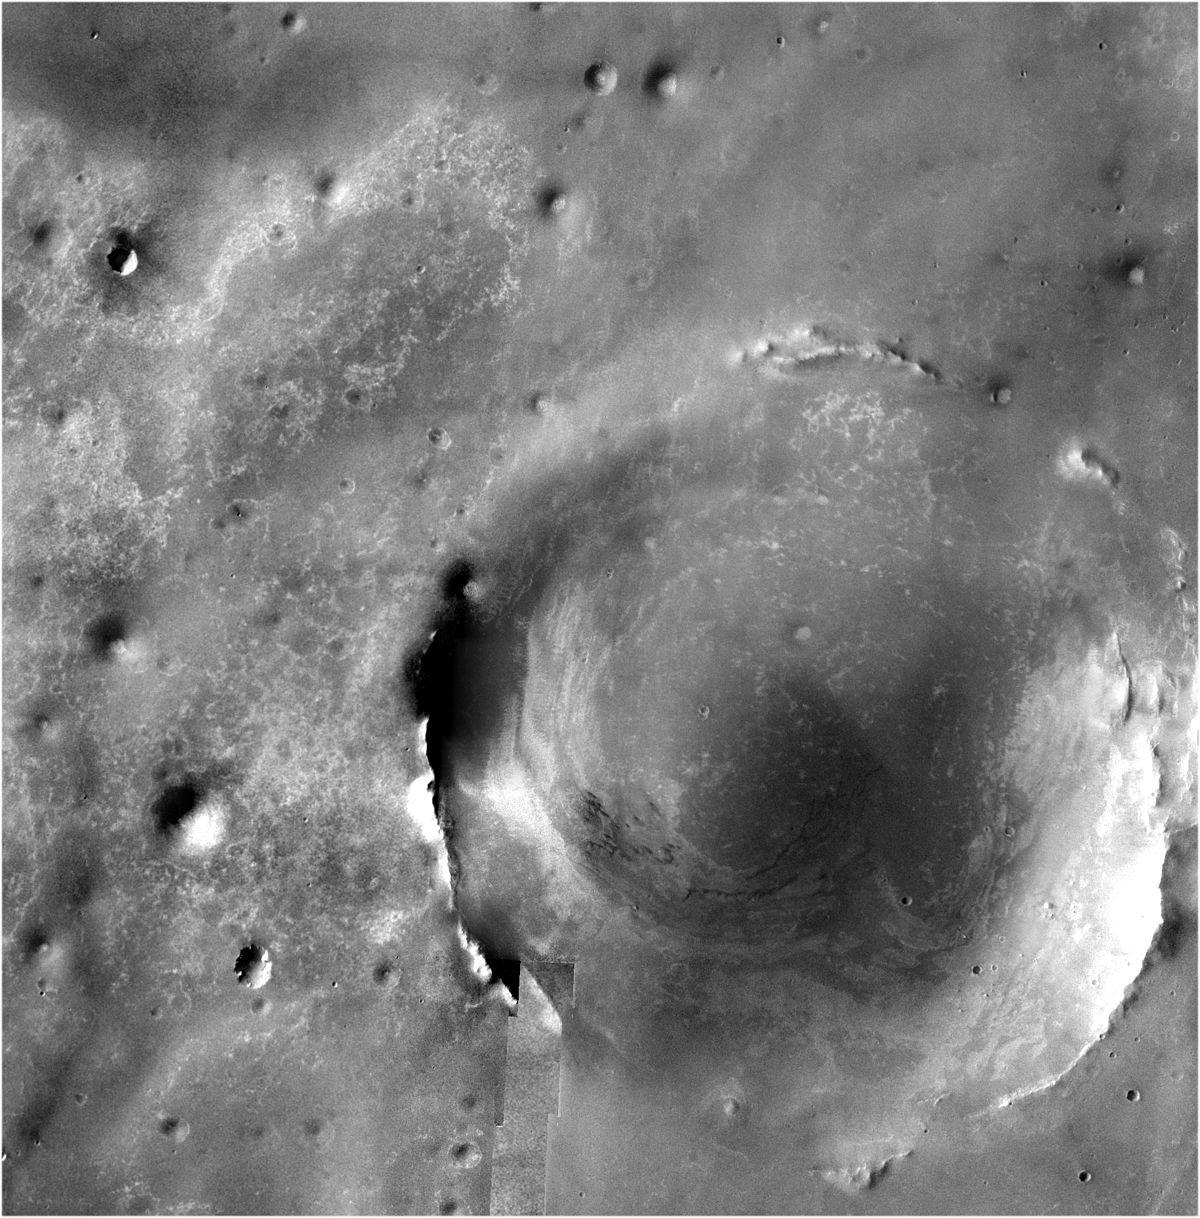 NASA начало детальное исследование водного кратера Индевор наМарсе